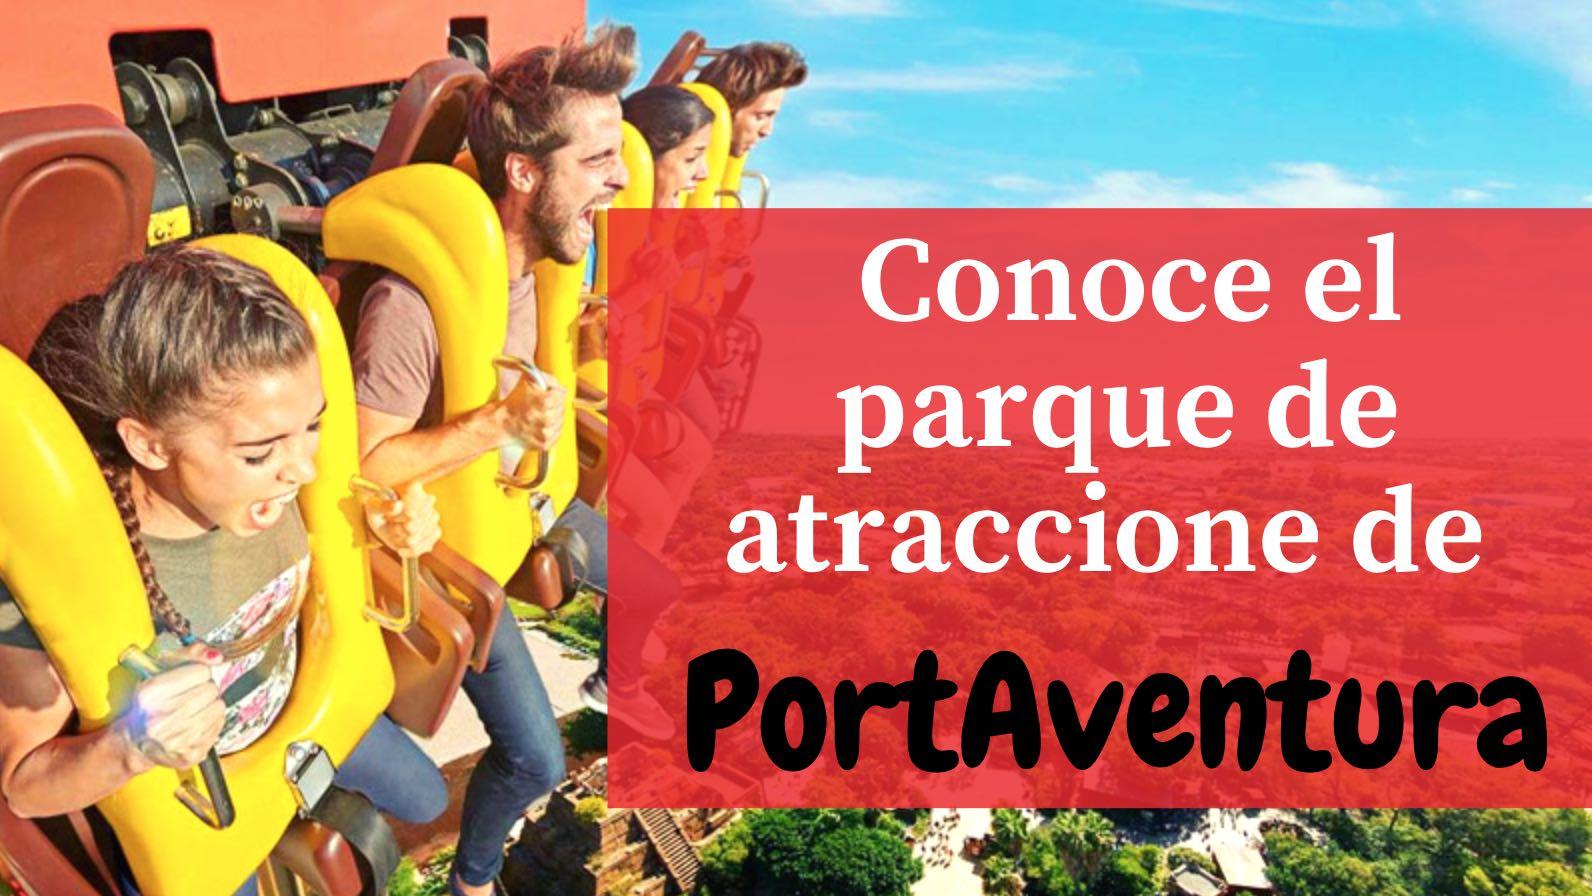 port aventura opinion guia